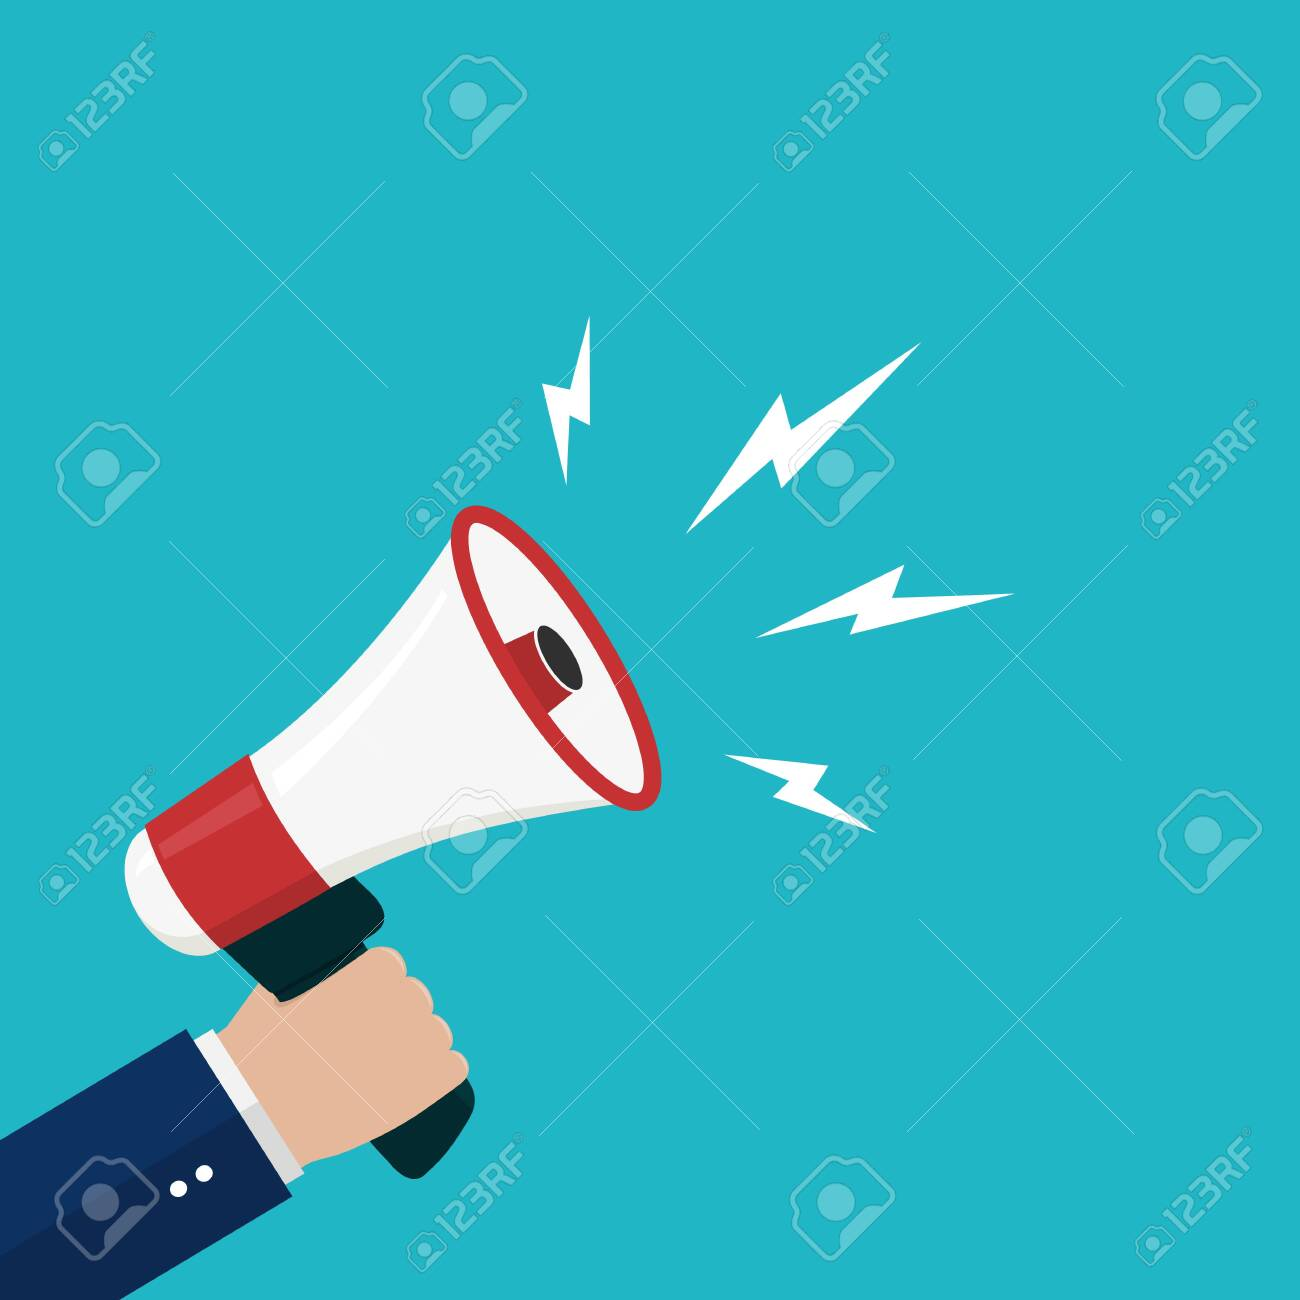 cartoon hand holding loudspeaker loud voice horn megaphone flat royalty free cliparts vectors and stock illustration image 133066873 cartoon hand holding loudspeaker loud voice horn megaphone flat